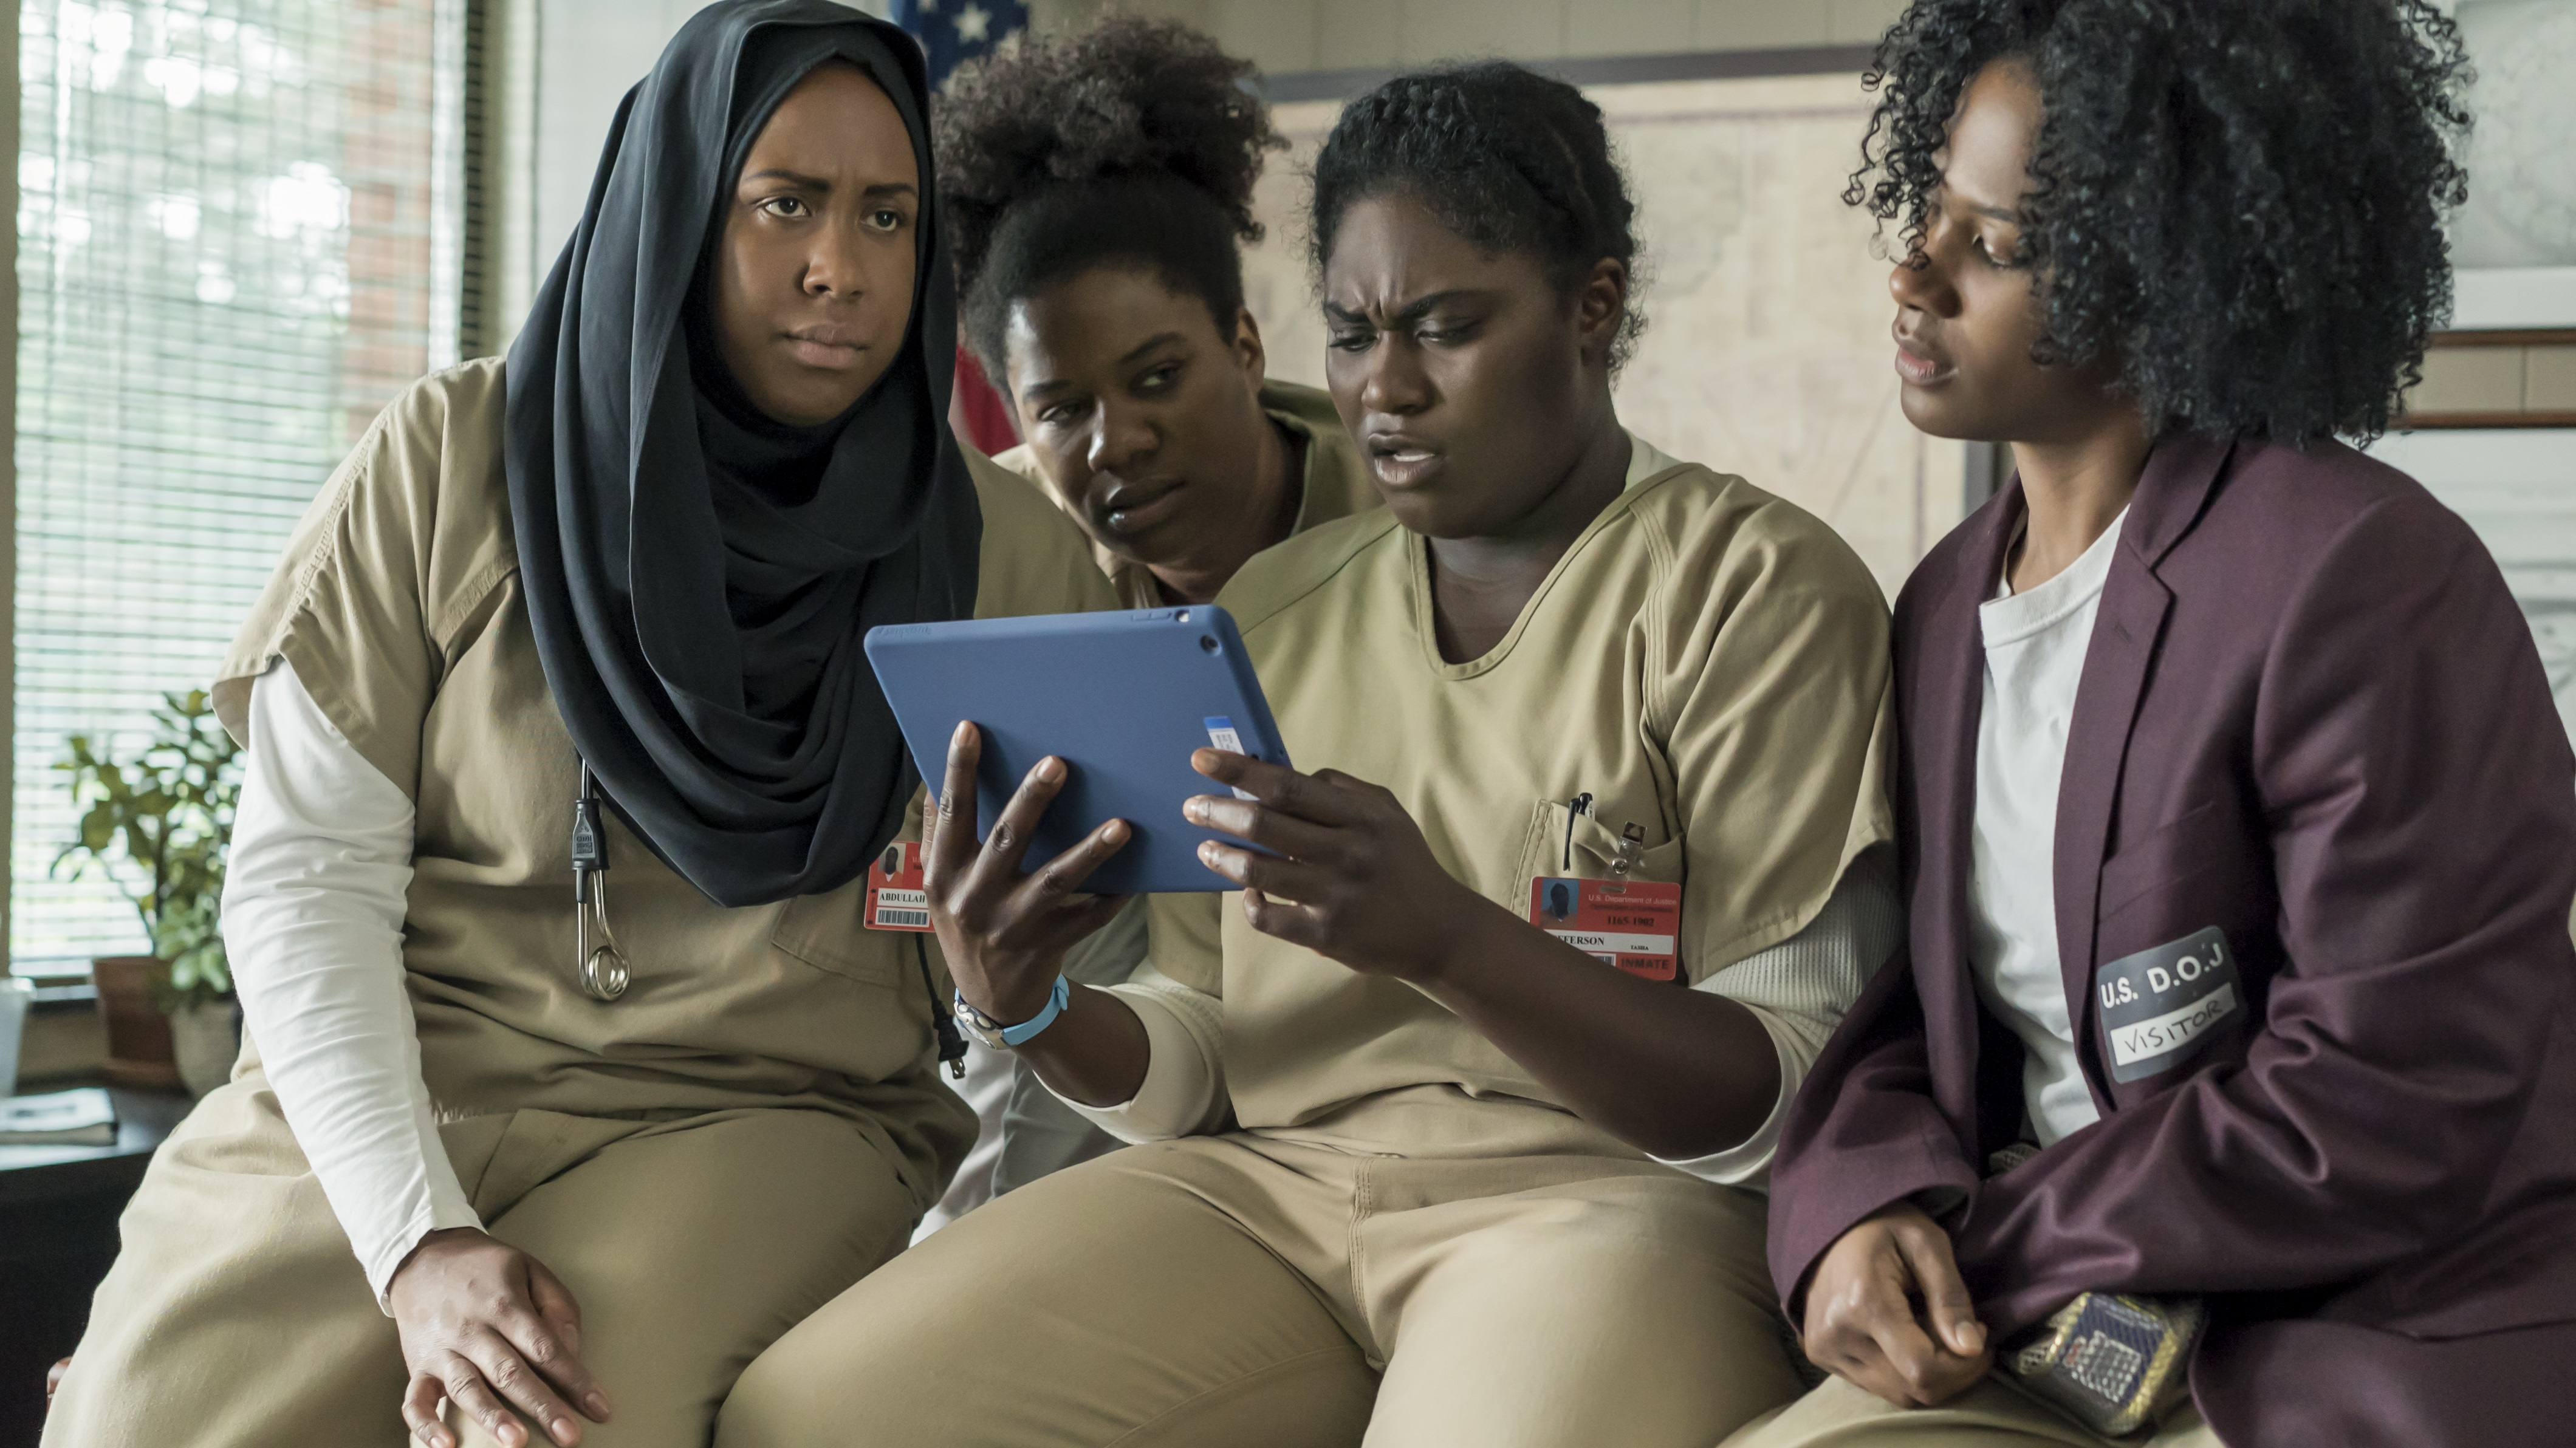 hacker leaks stolen orange is the new black season 5 episodes to piracy network variety